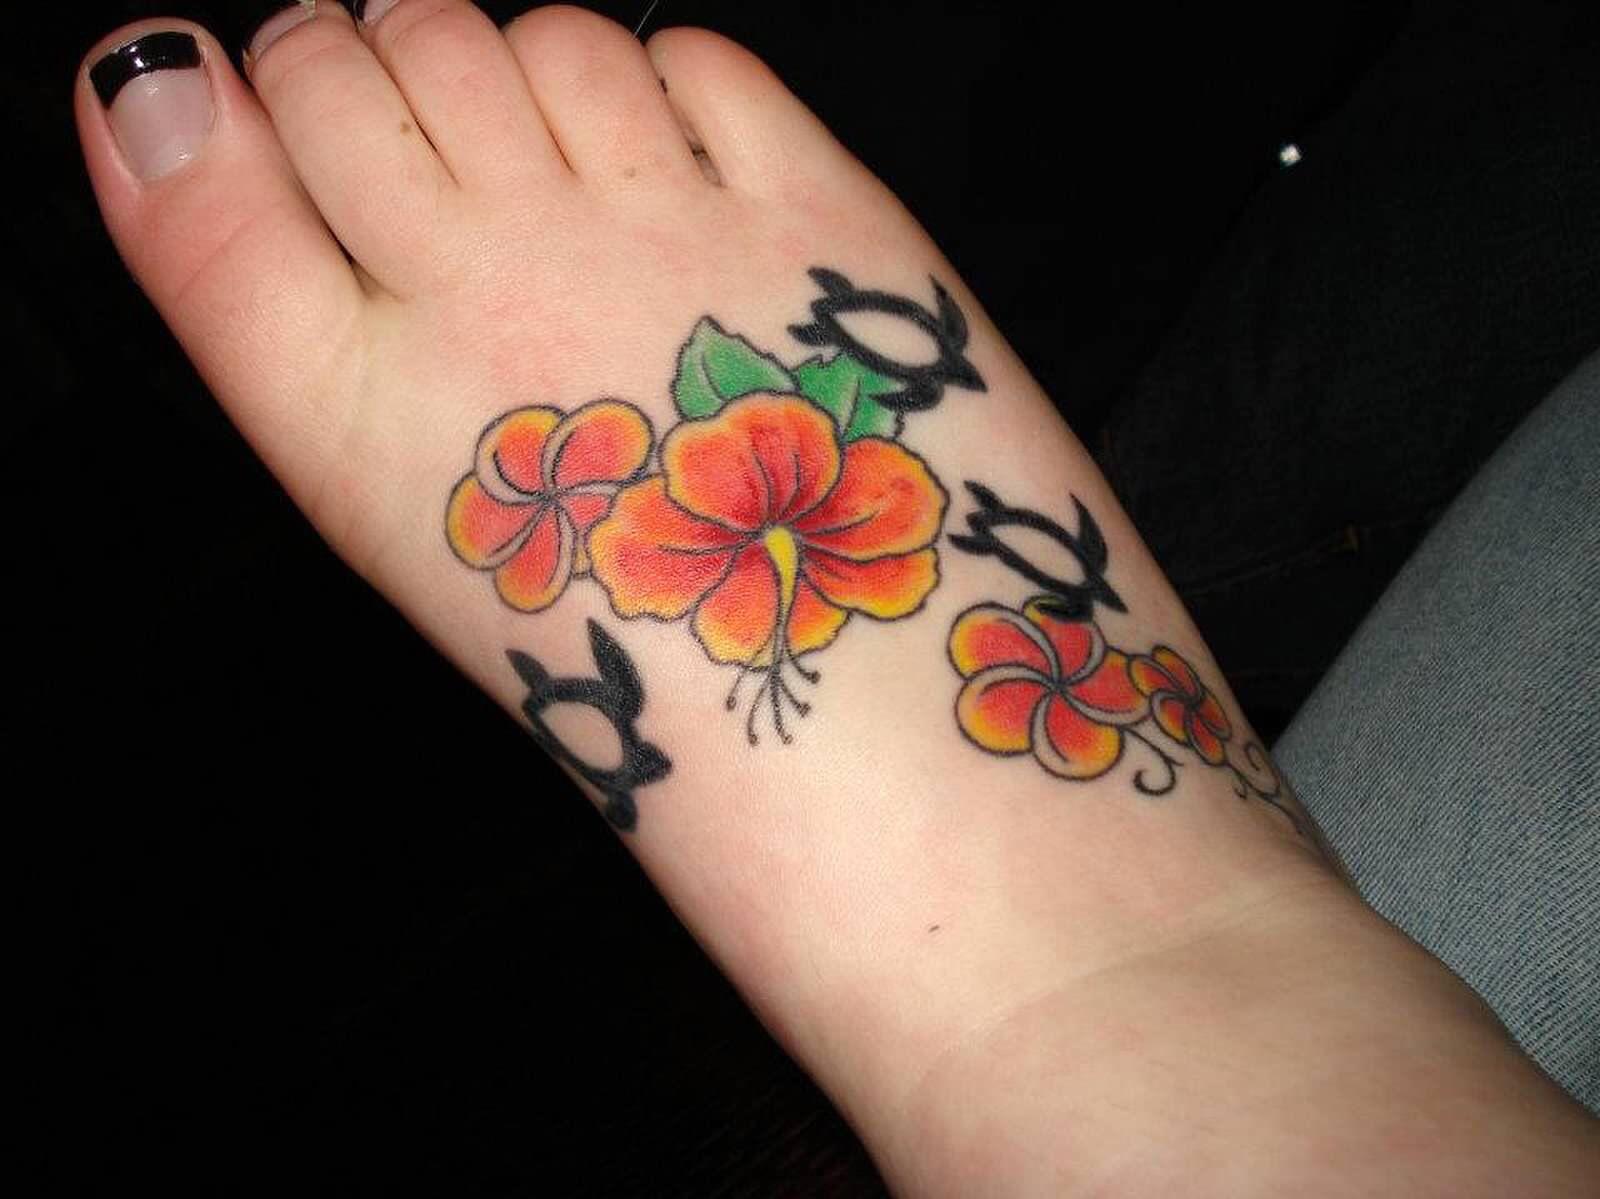 Hawaiian Foot Tattoo Done Skin Deep Hibiscus Plumerias And Honus